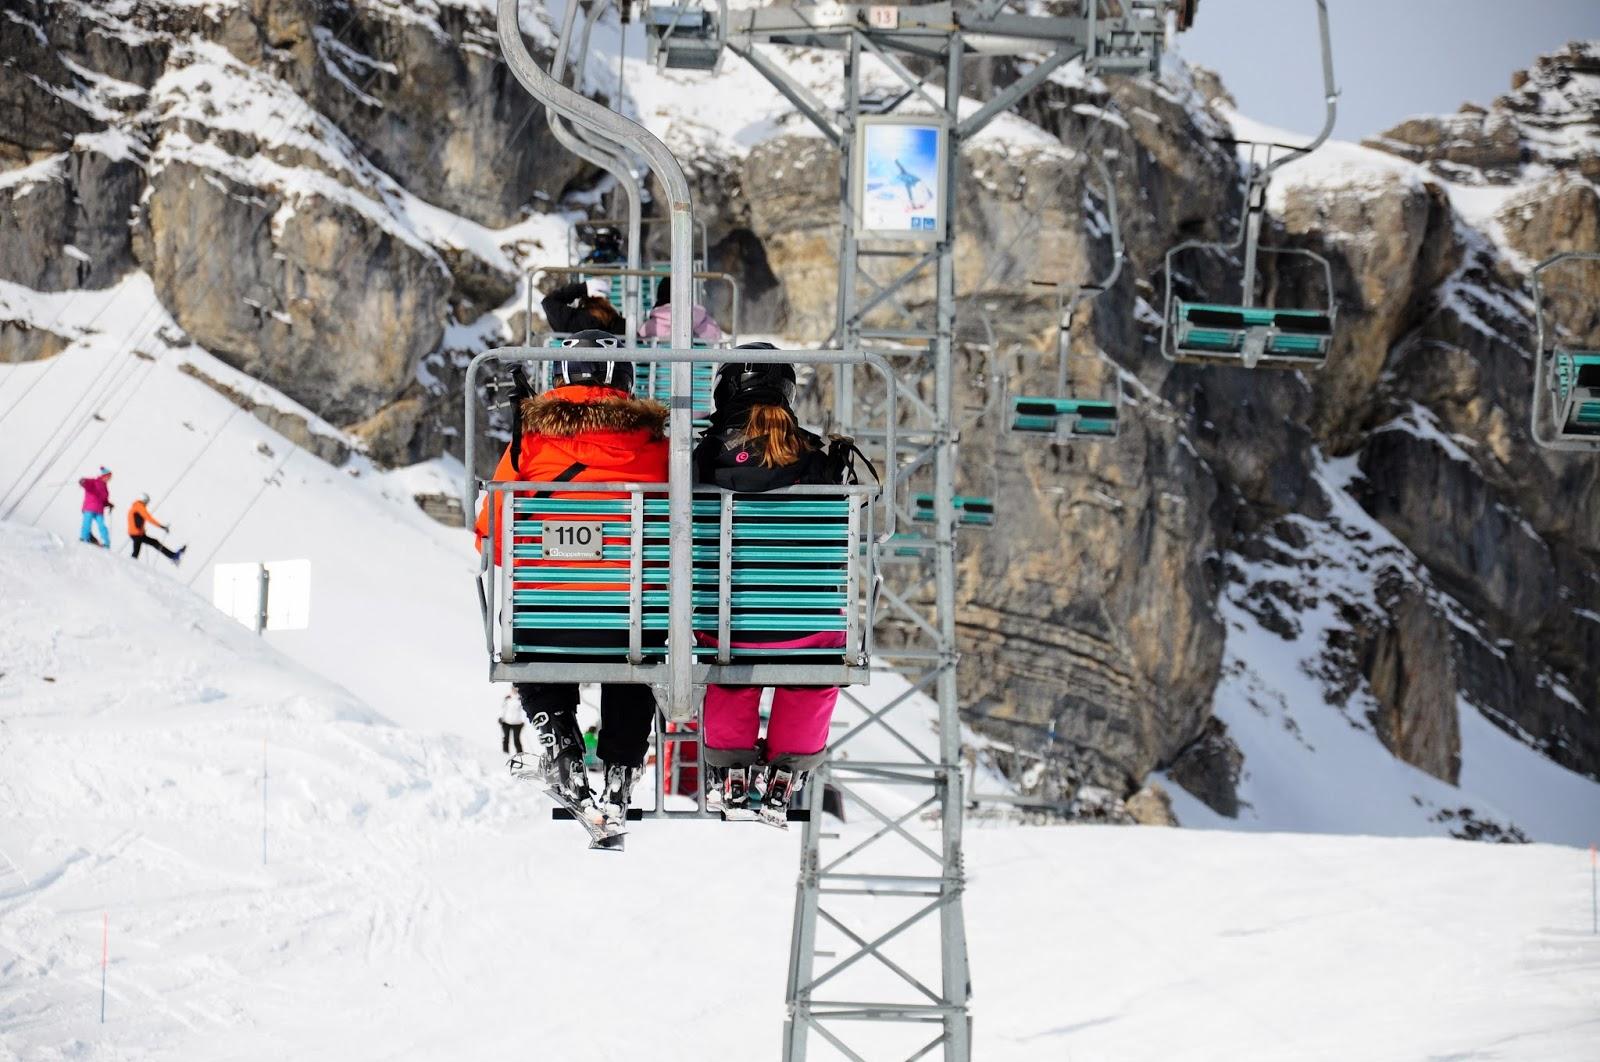 Crans Montana, Valais